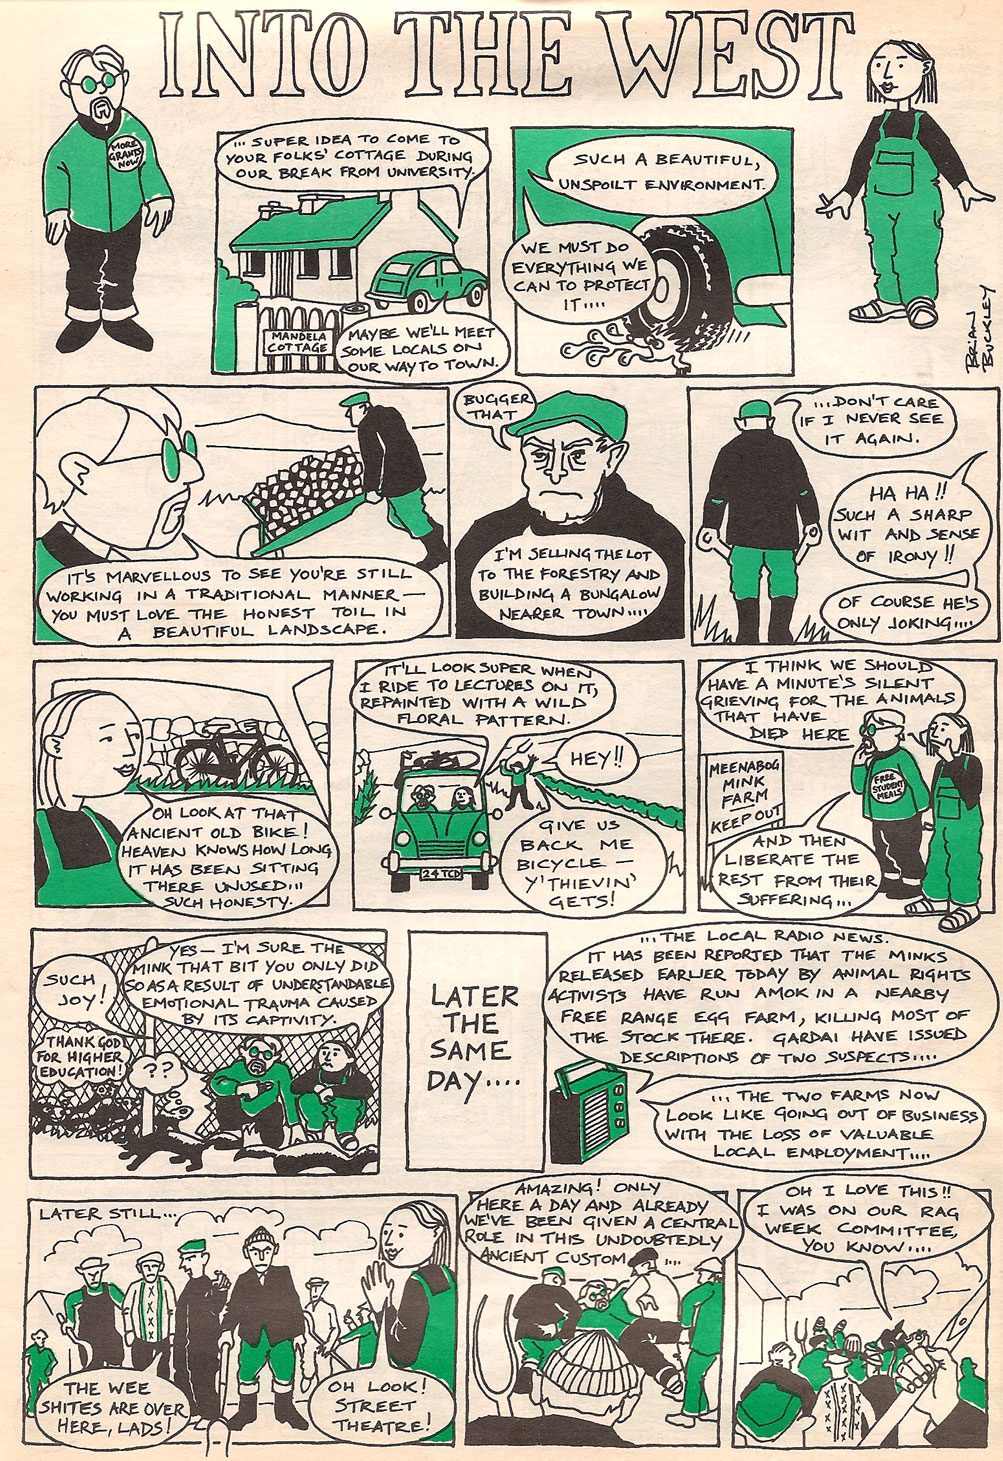 fitz irish comic april 1995 brian buckley